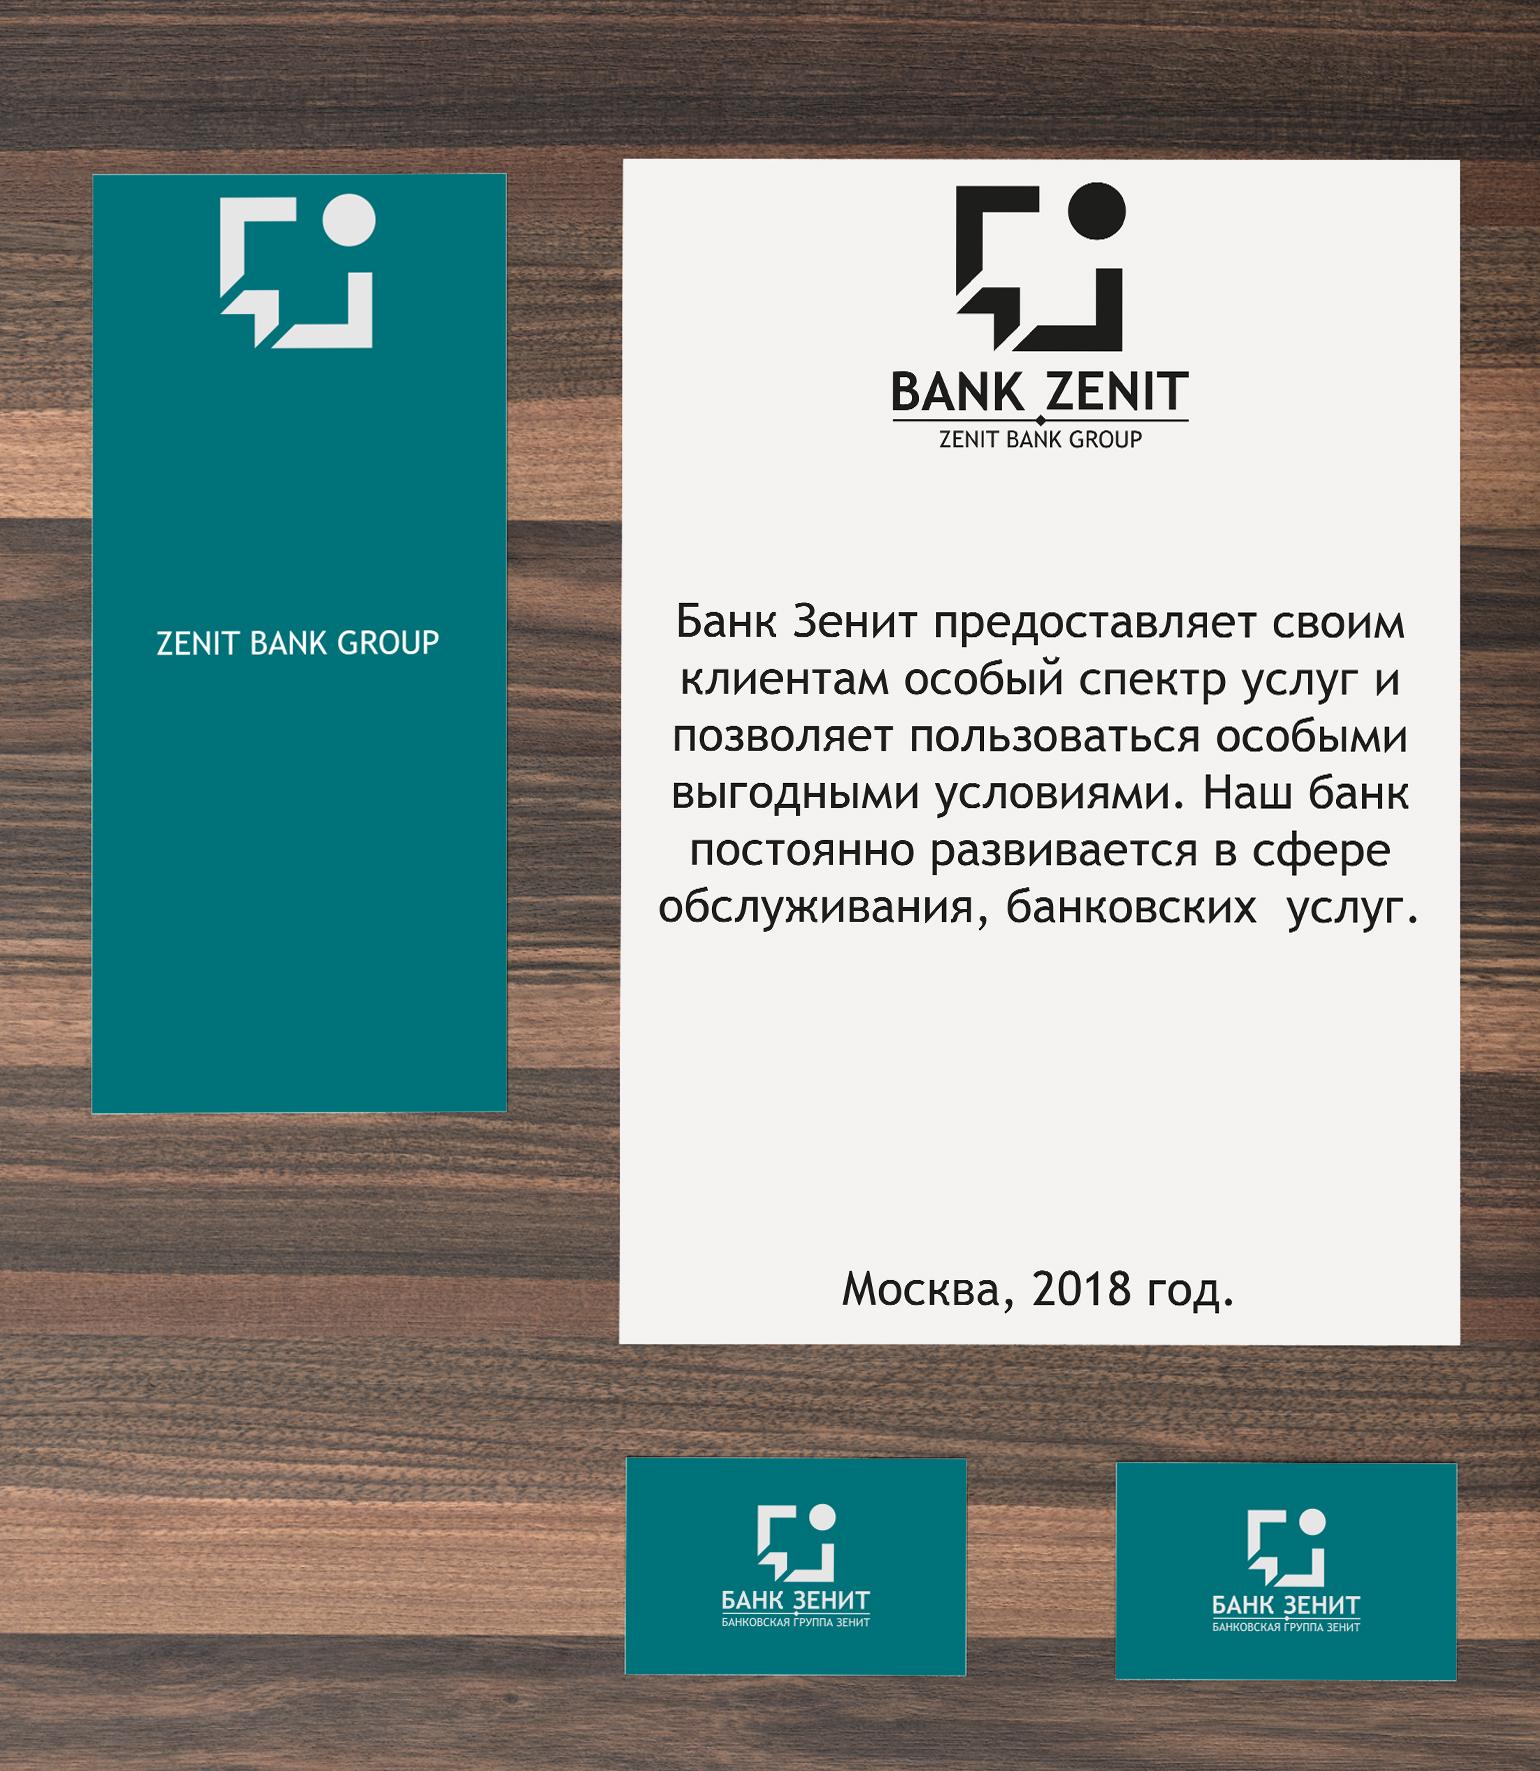 Разработка логотипа для Банка ЗЕНИТ фото f_3475b4858d64b822.jpg